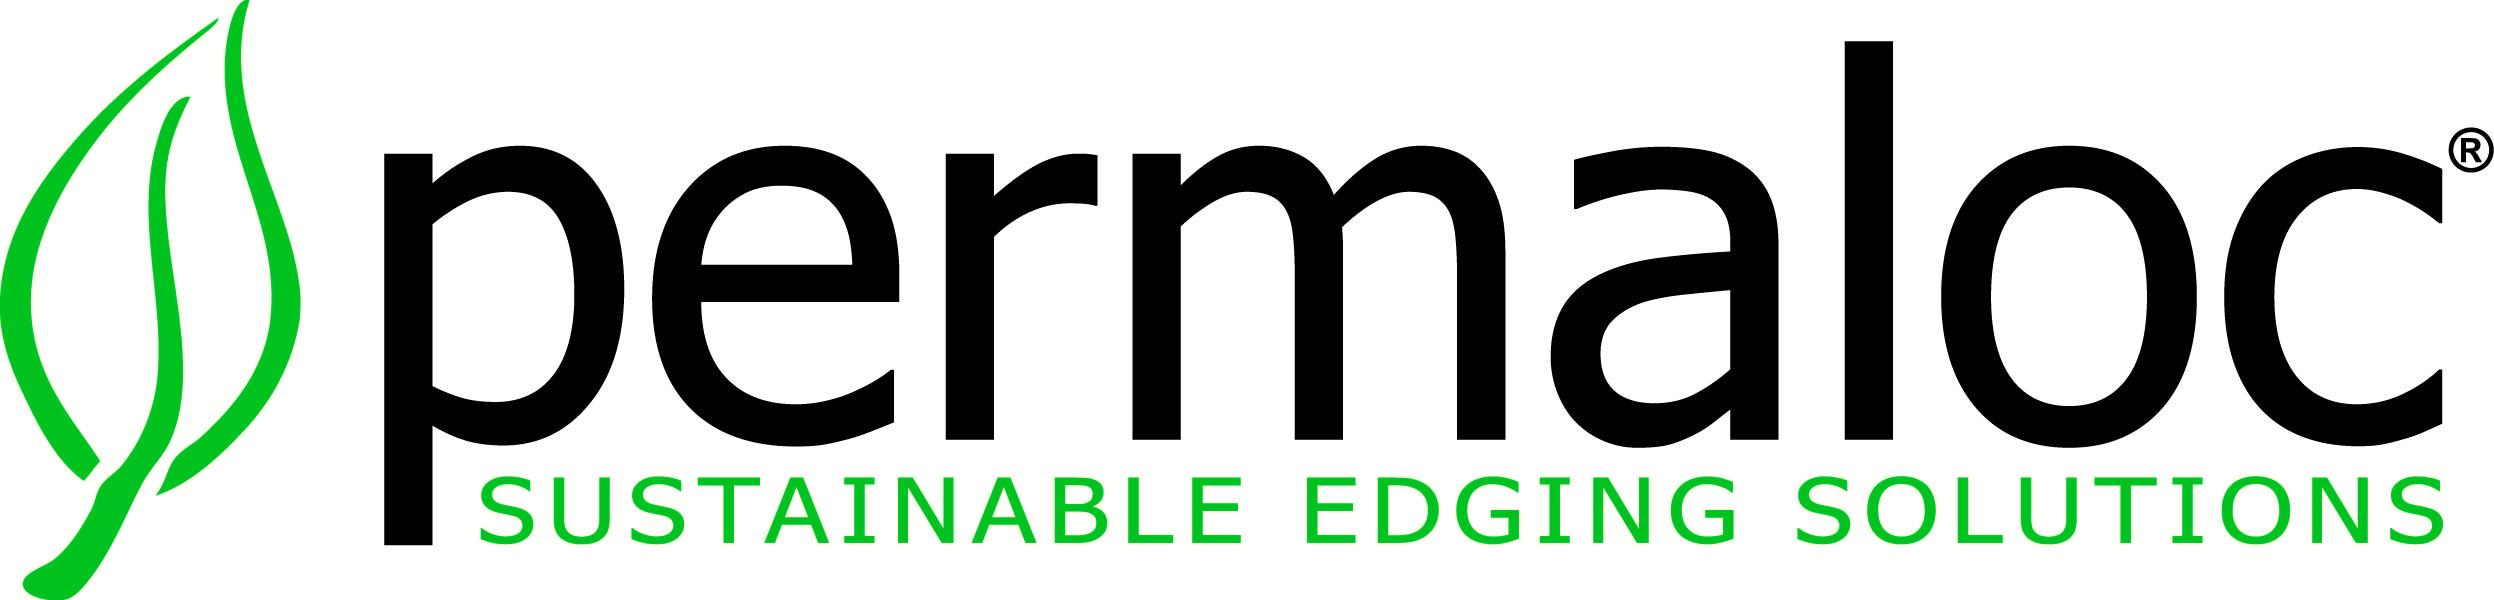 Permaloc Vector Logo.jpg